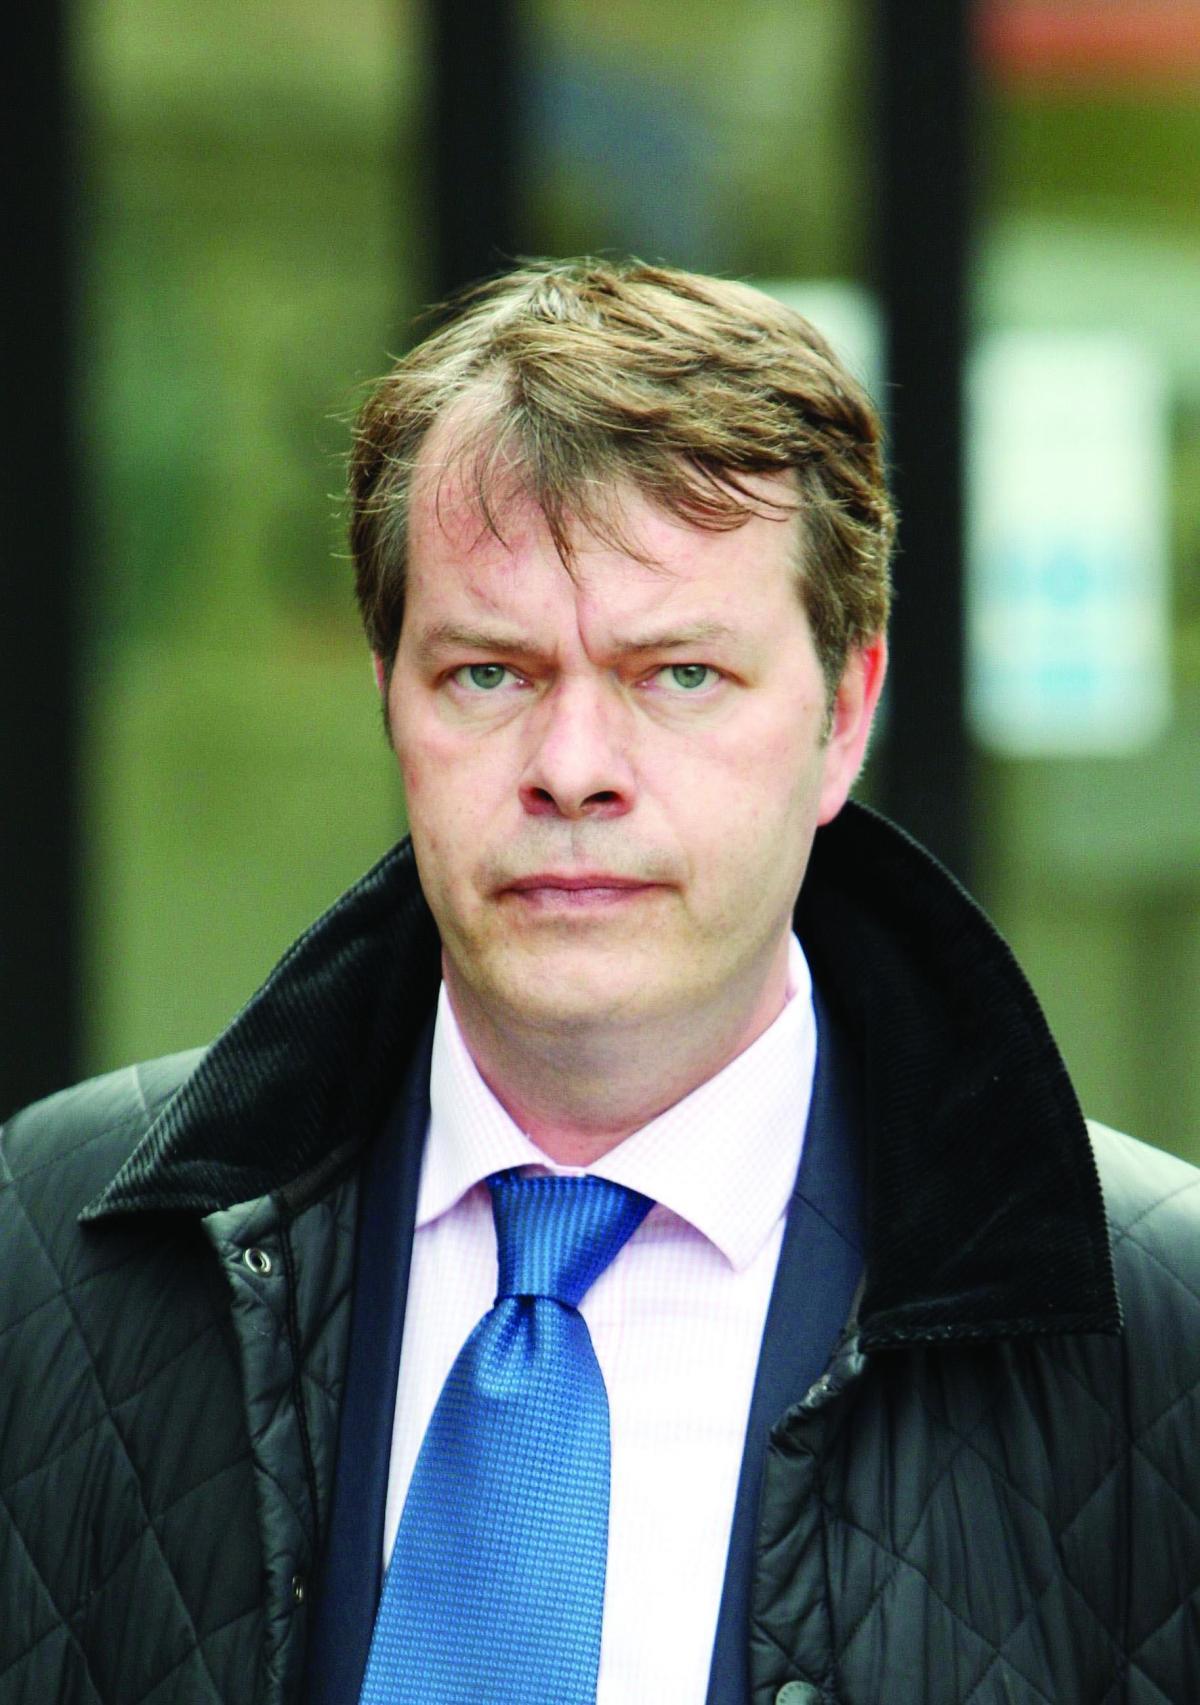 Fulcher drama called 'a moral conundrum'